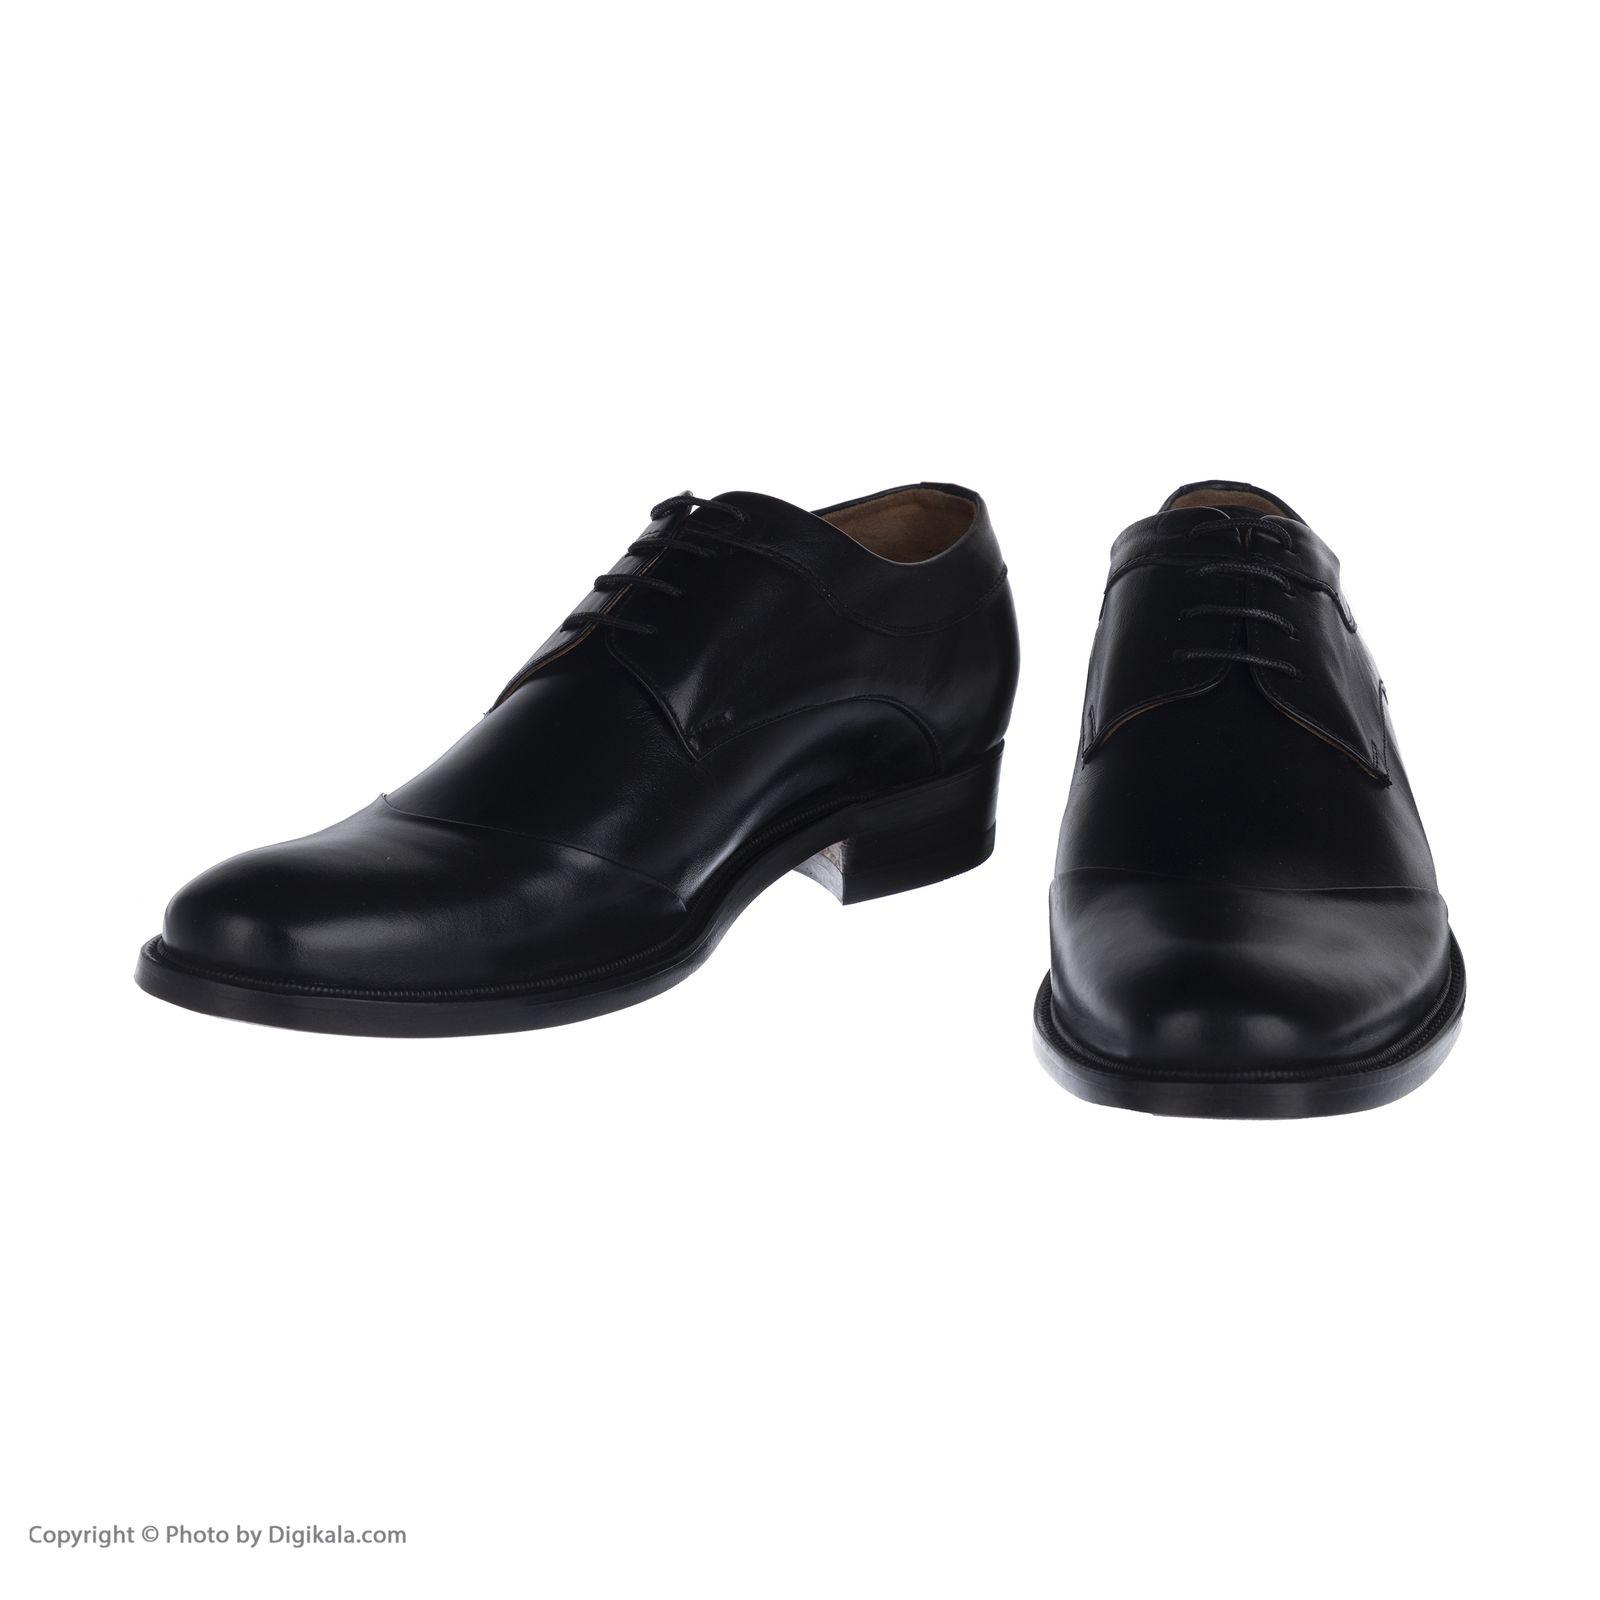 کفش مردانه نظری کد 423 -  - 4